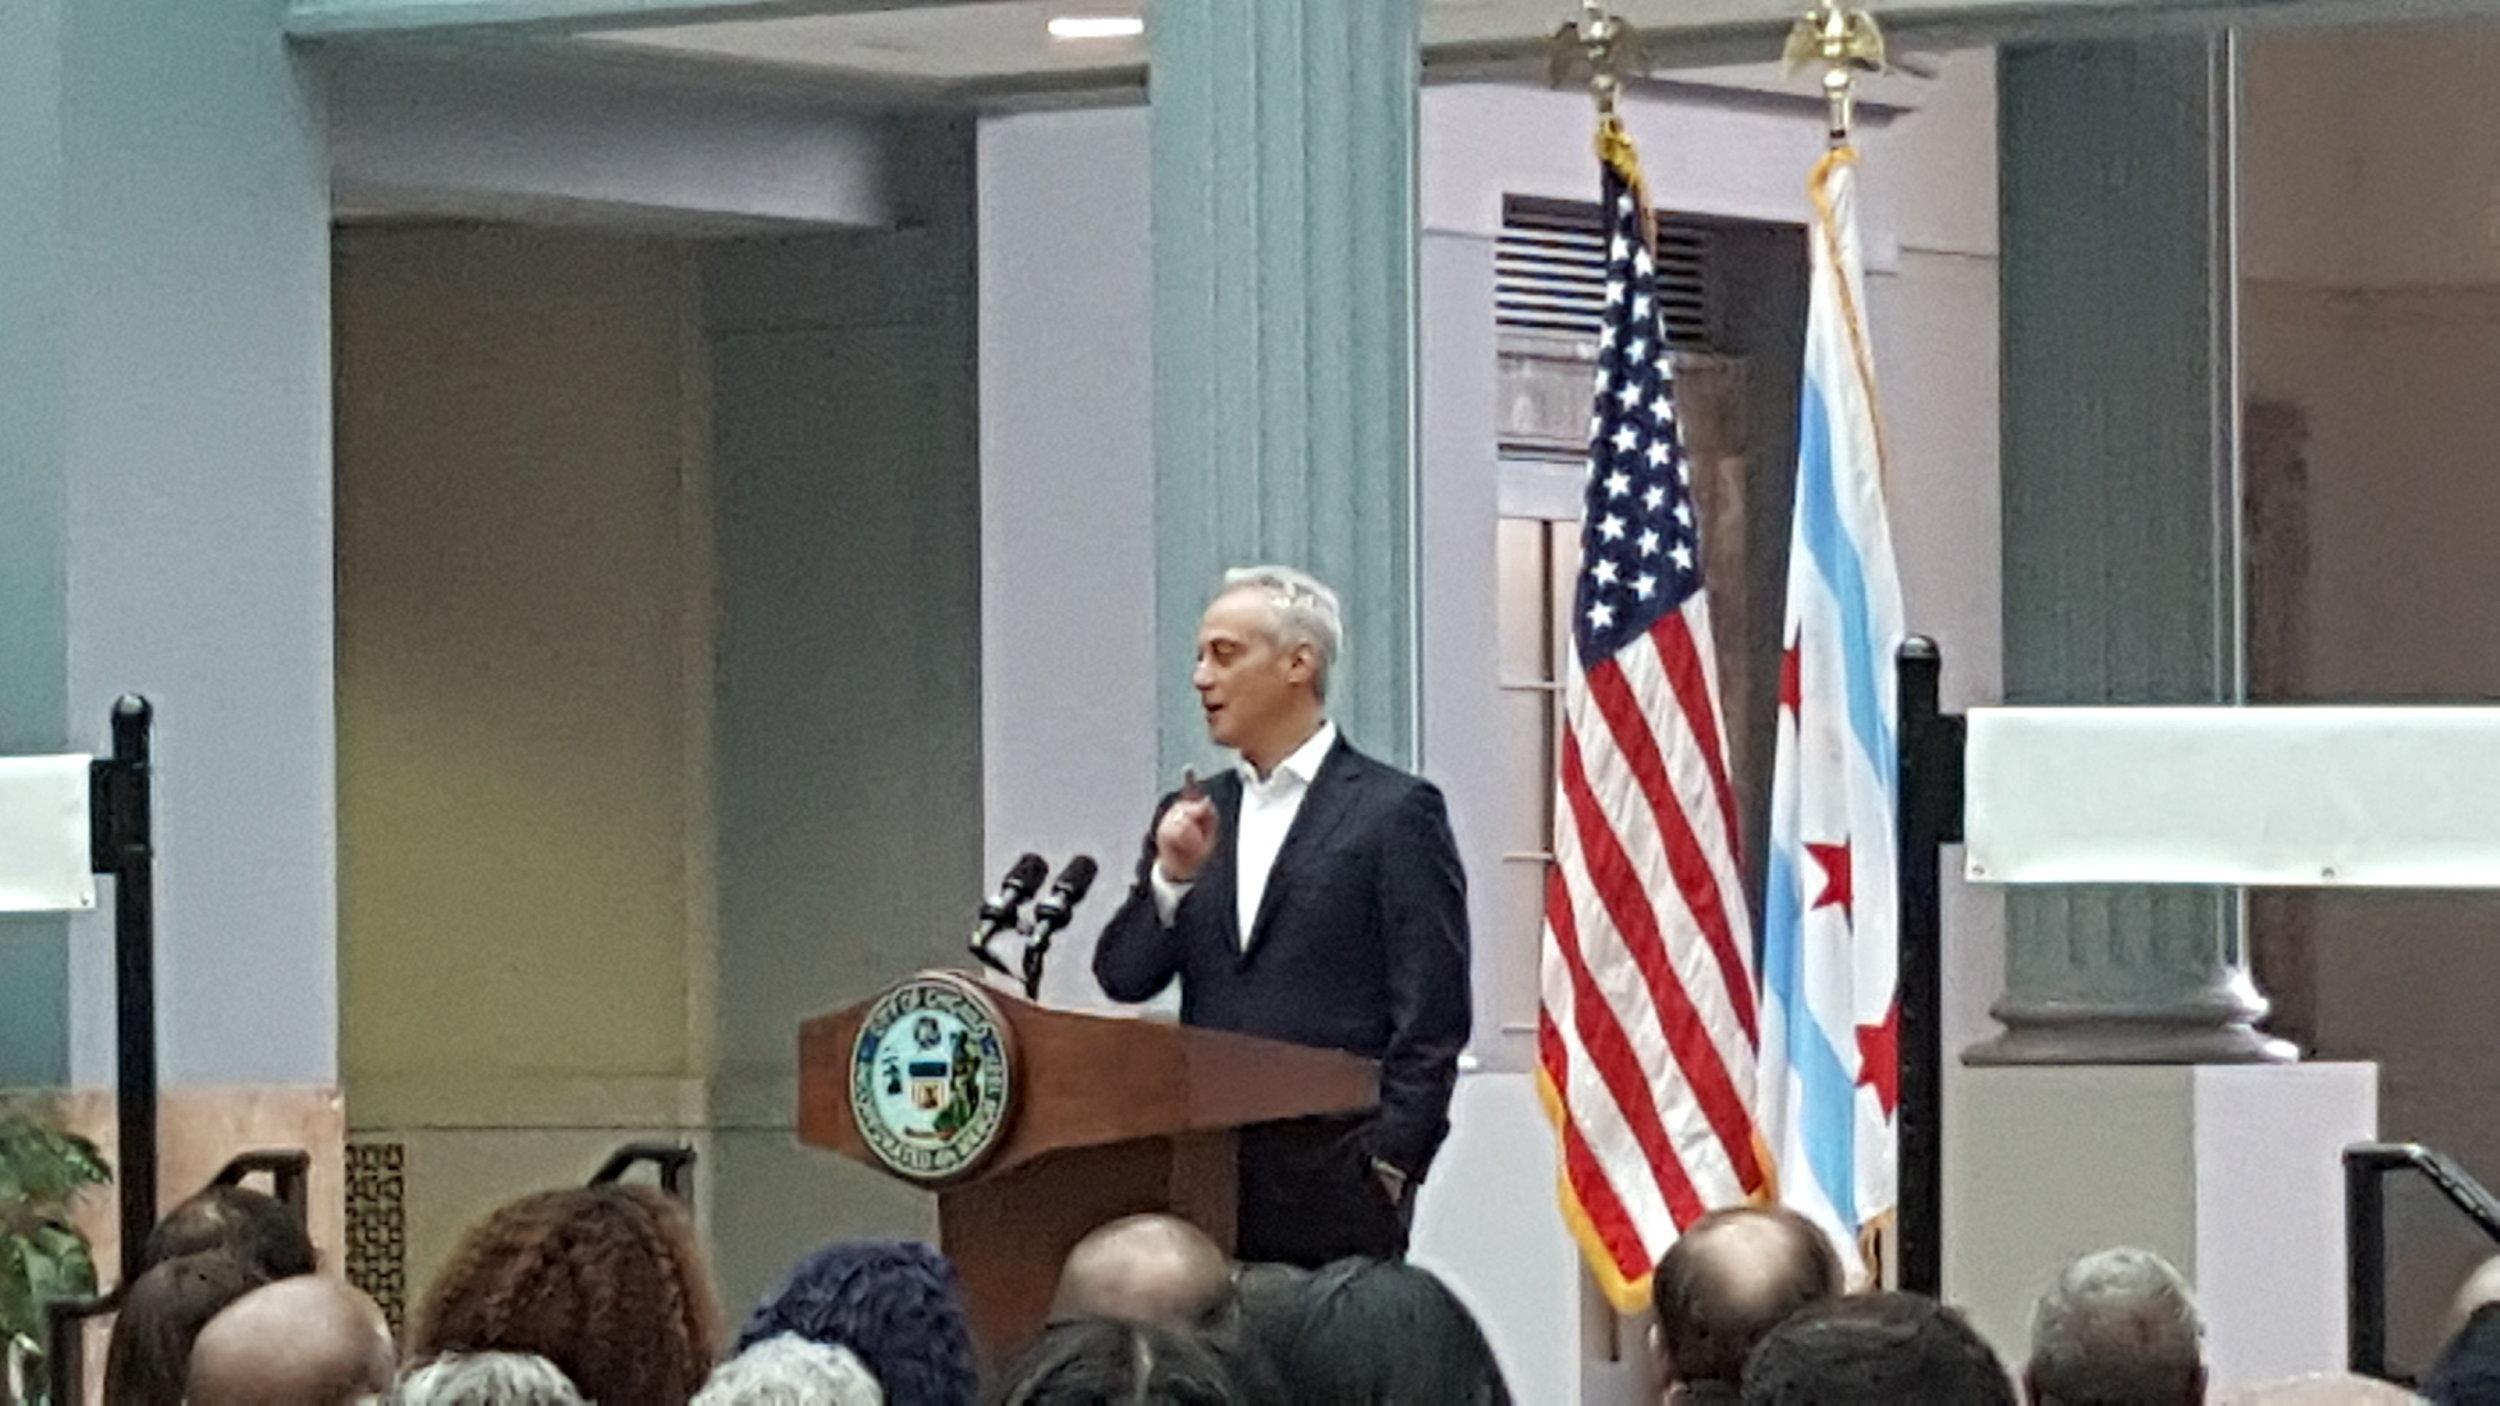 20190211_mayor rahm emanuel_ida b wells unveiling_honorary chicago.jpg